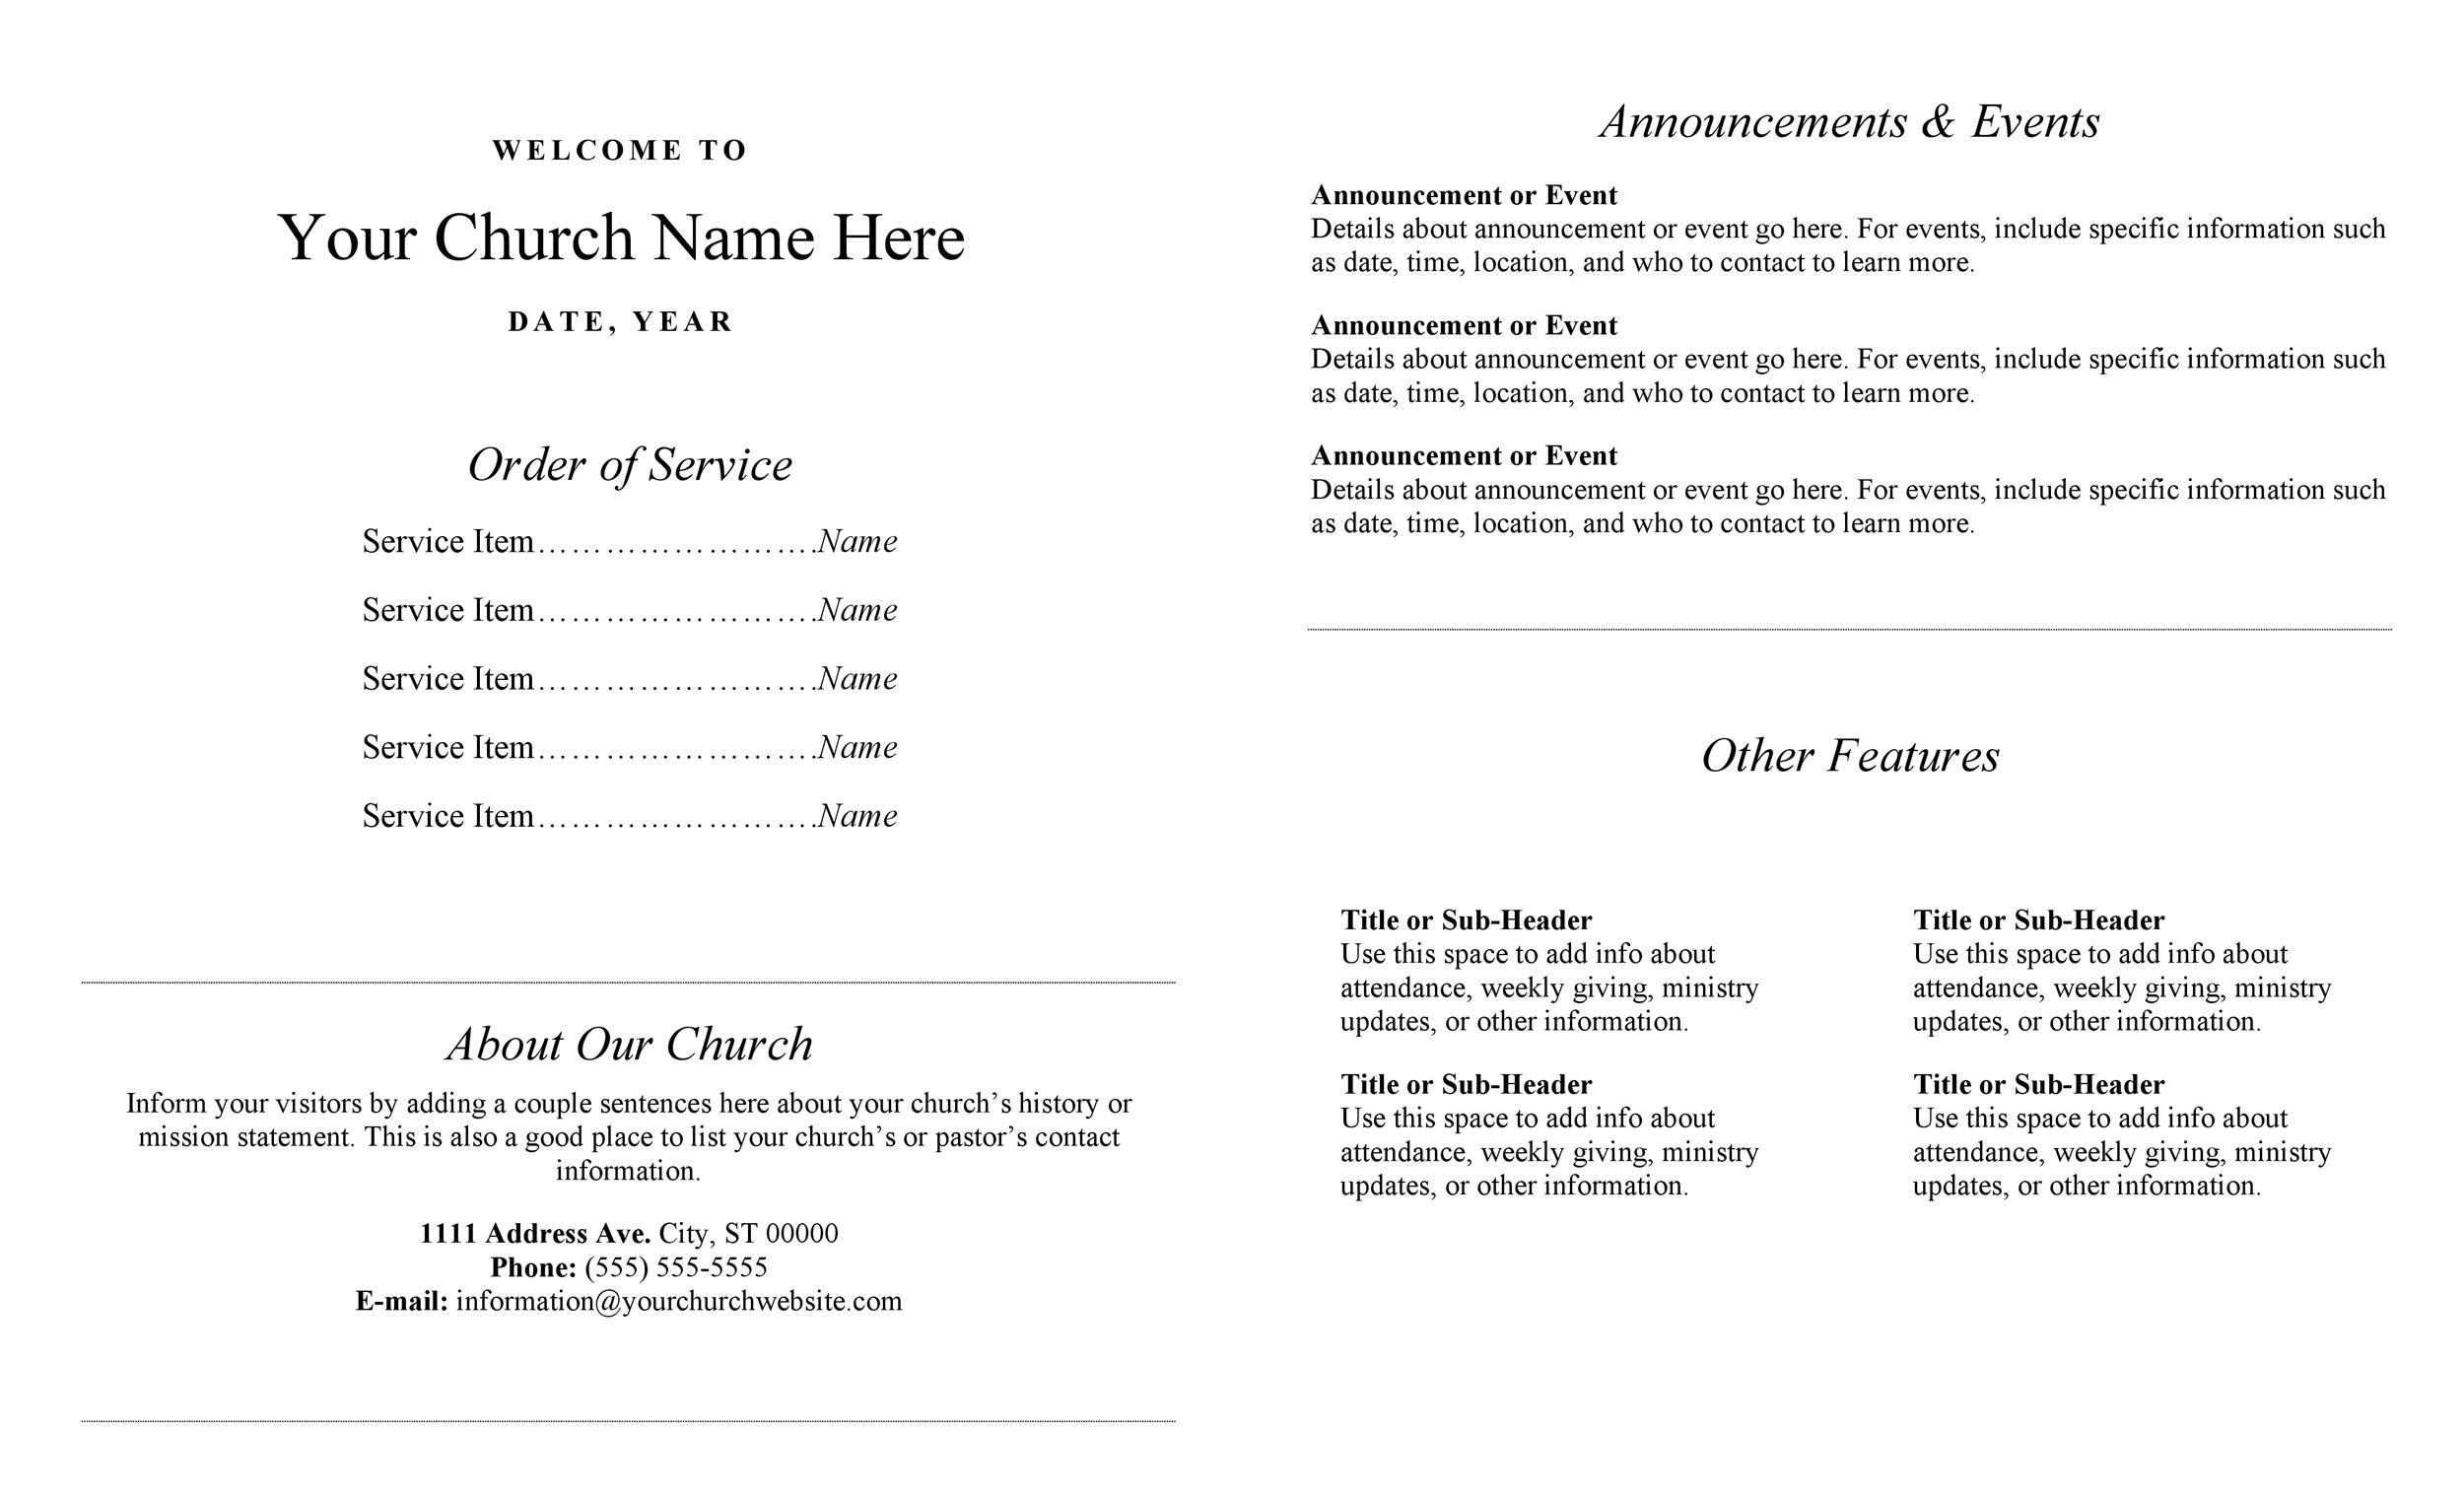 006 Breathtaking Church Bulletin Template Word Image  Program Free WeddingFull